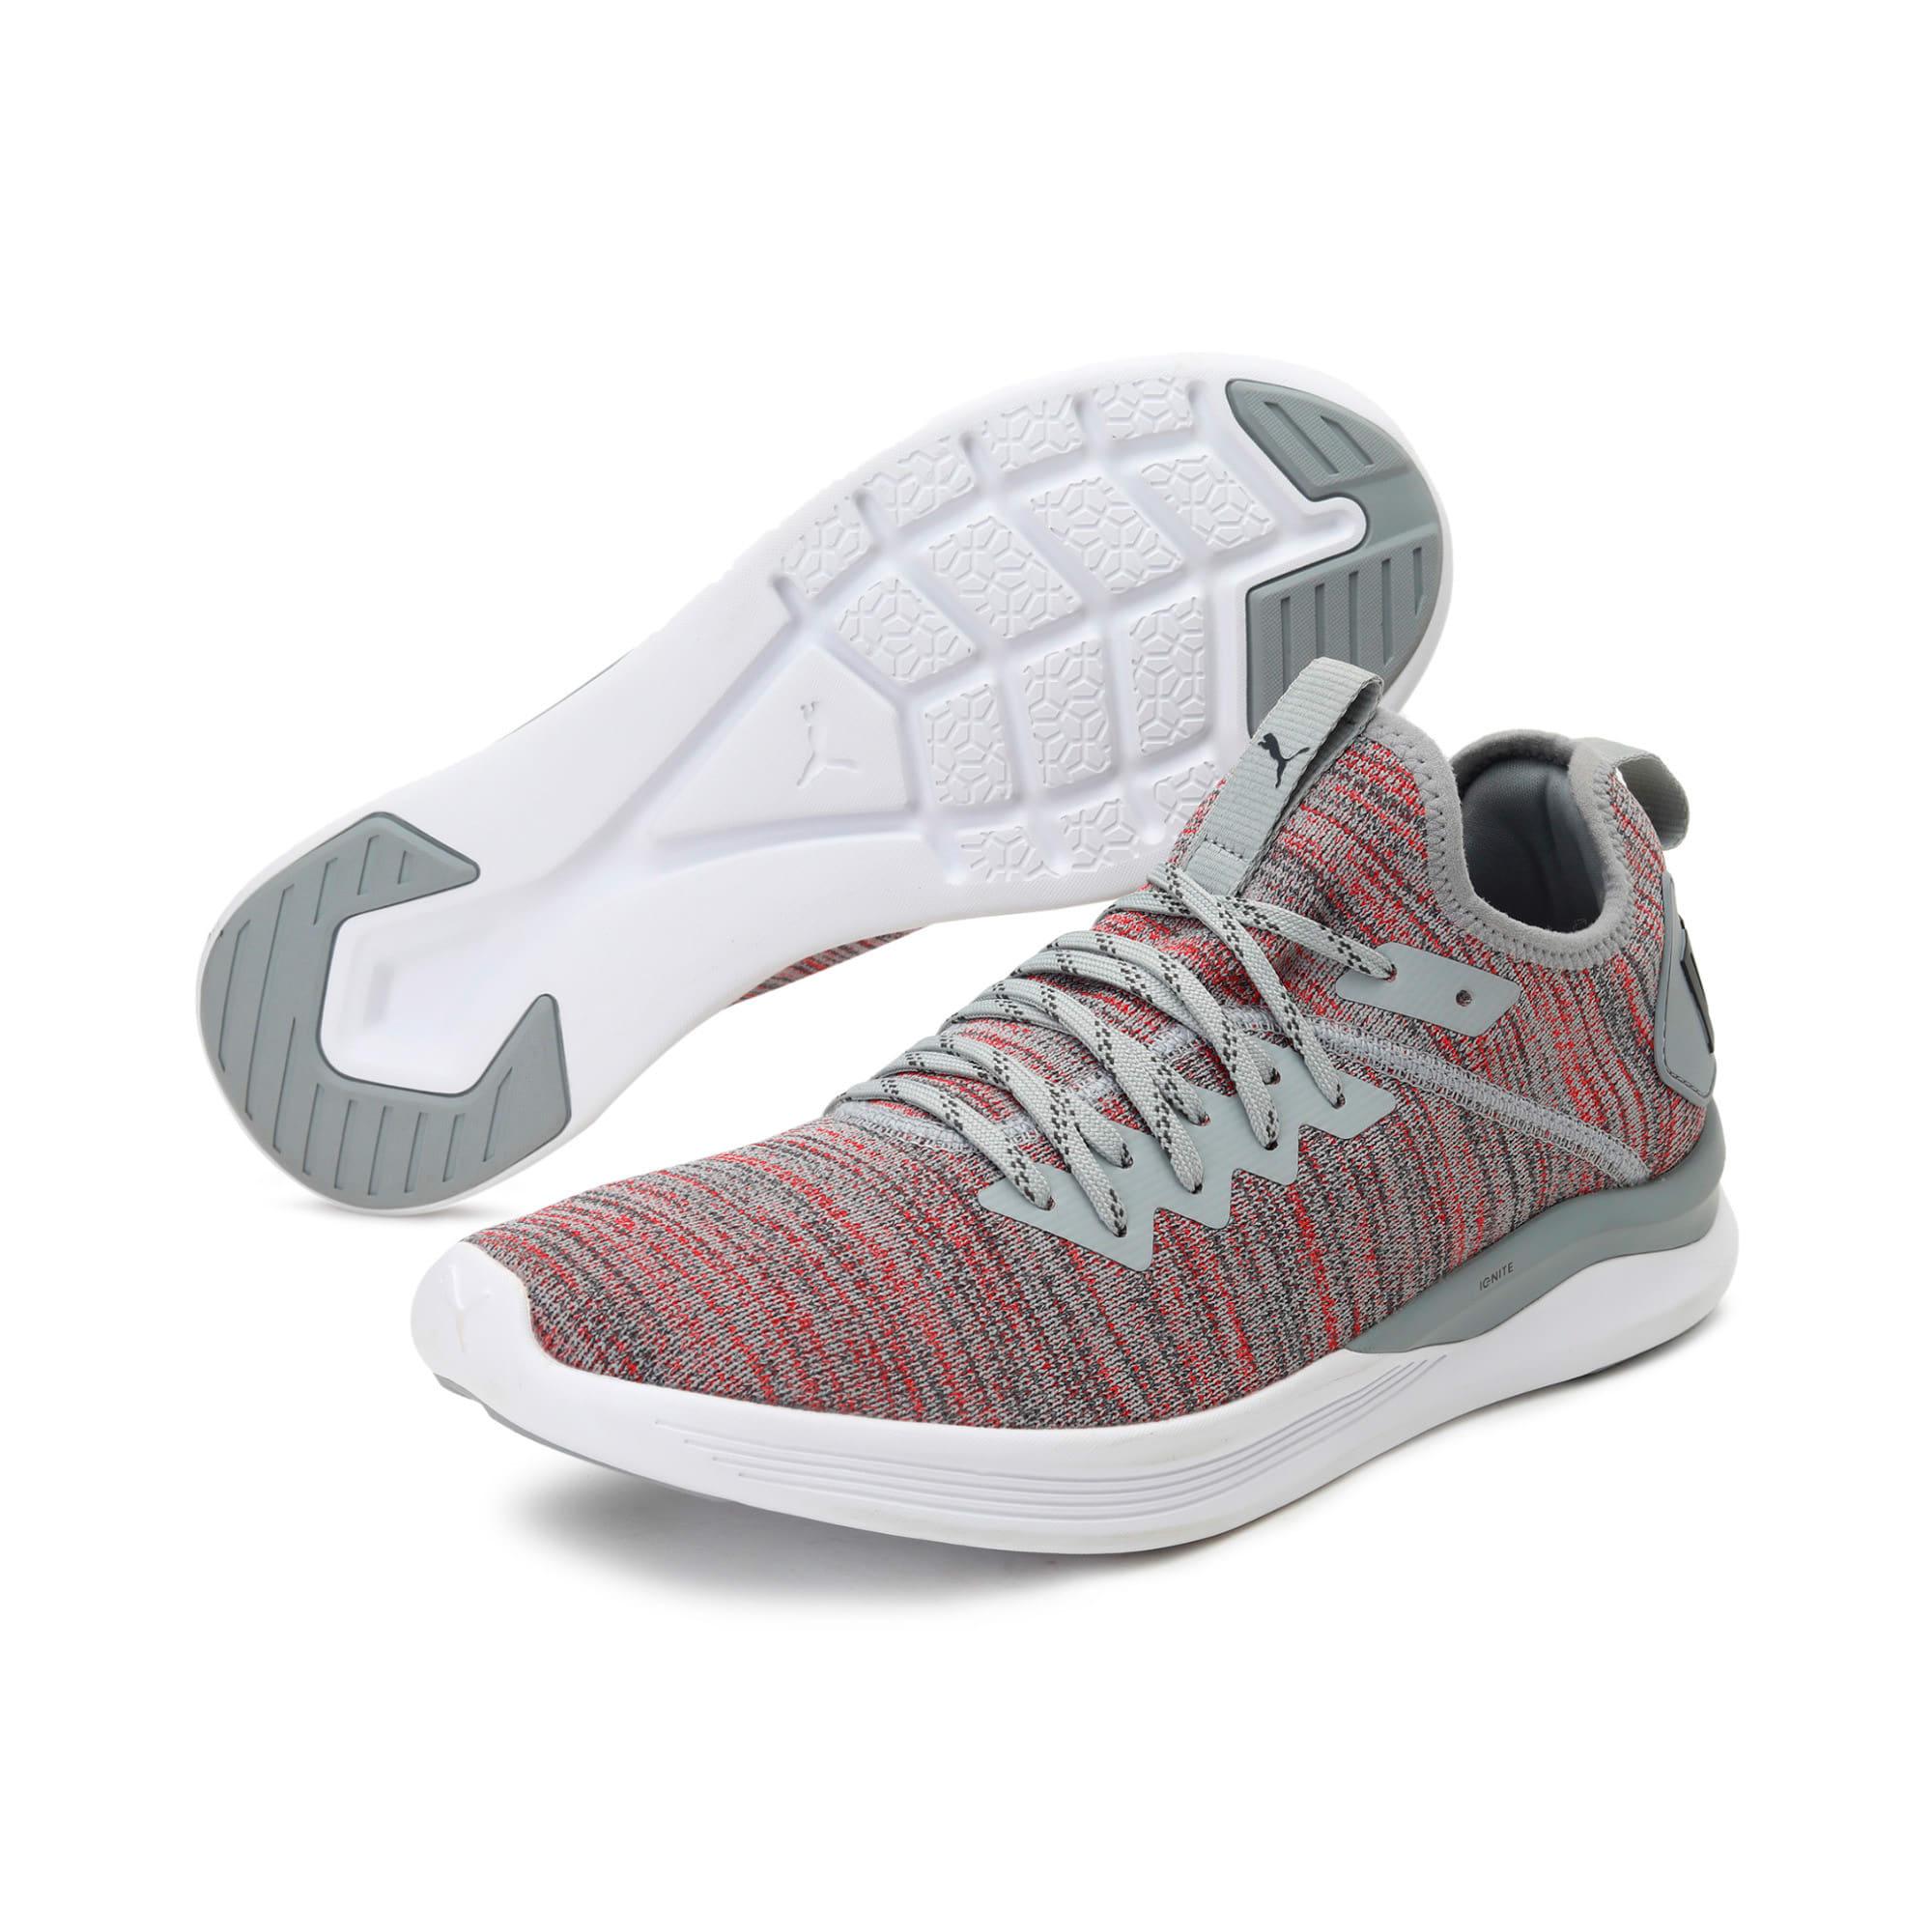 Thumbnail 2 of IGNITE Flash evoKNIT Men's Training Shoes, Quarry-High Risk Red-Asphalt, medium-IND